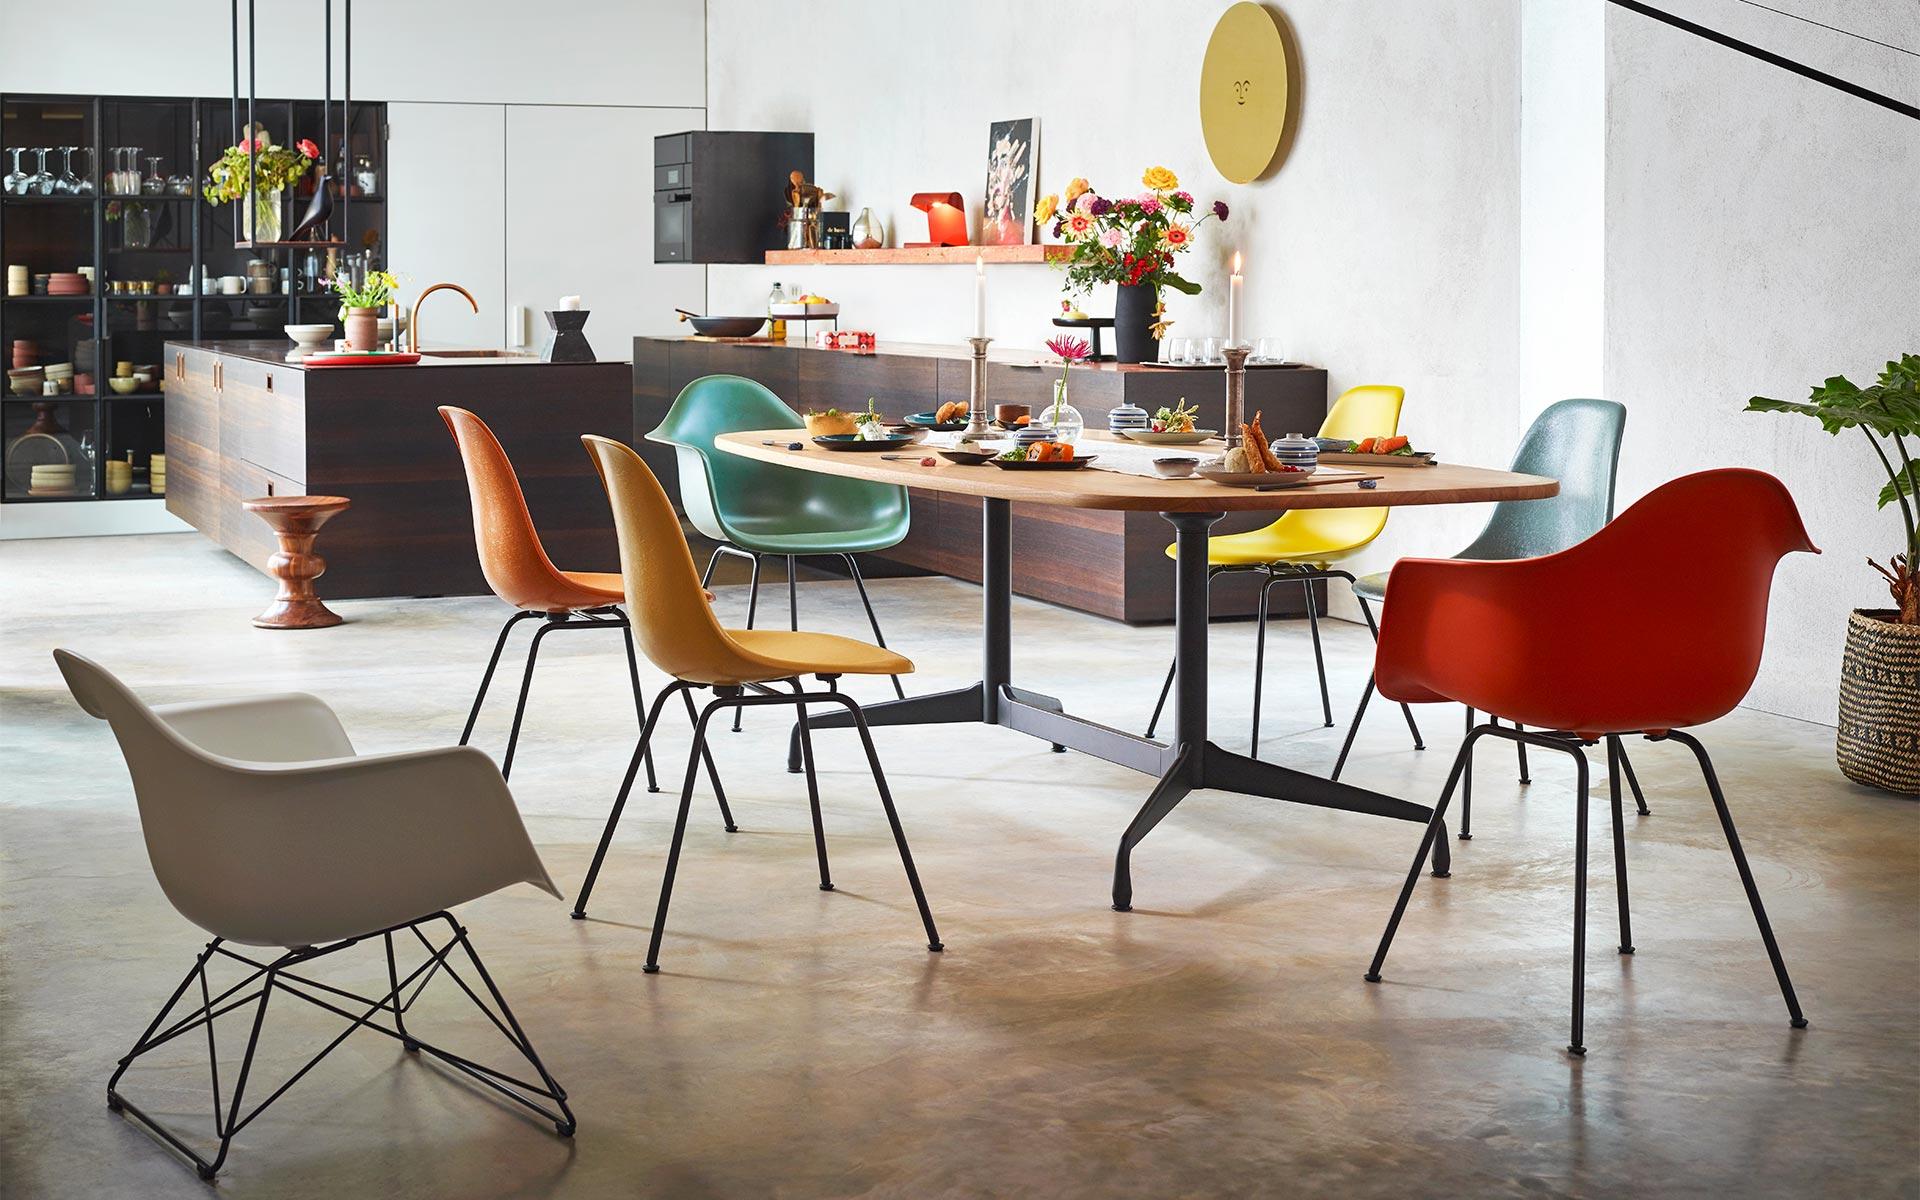 Vitra Eames Fiberglass Chair Angebot 6+1